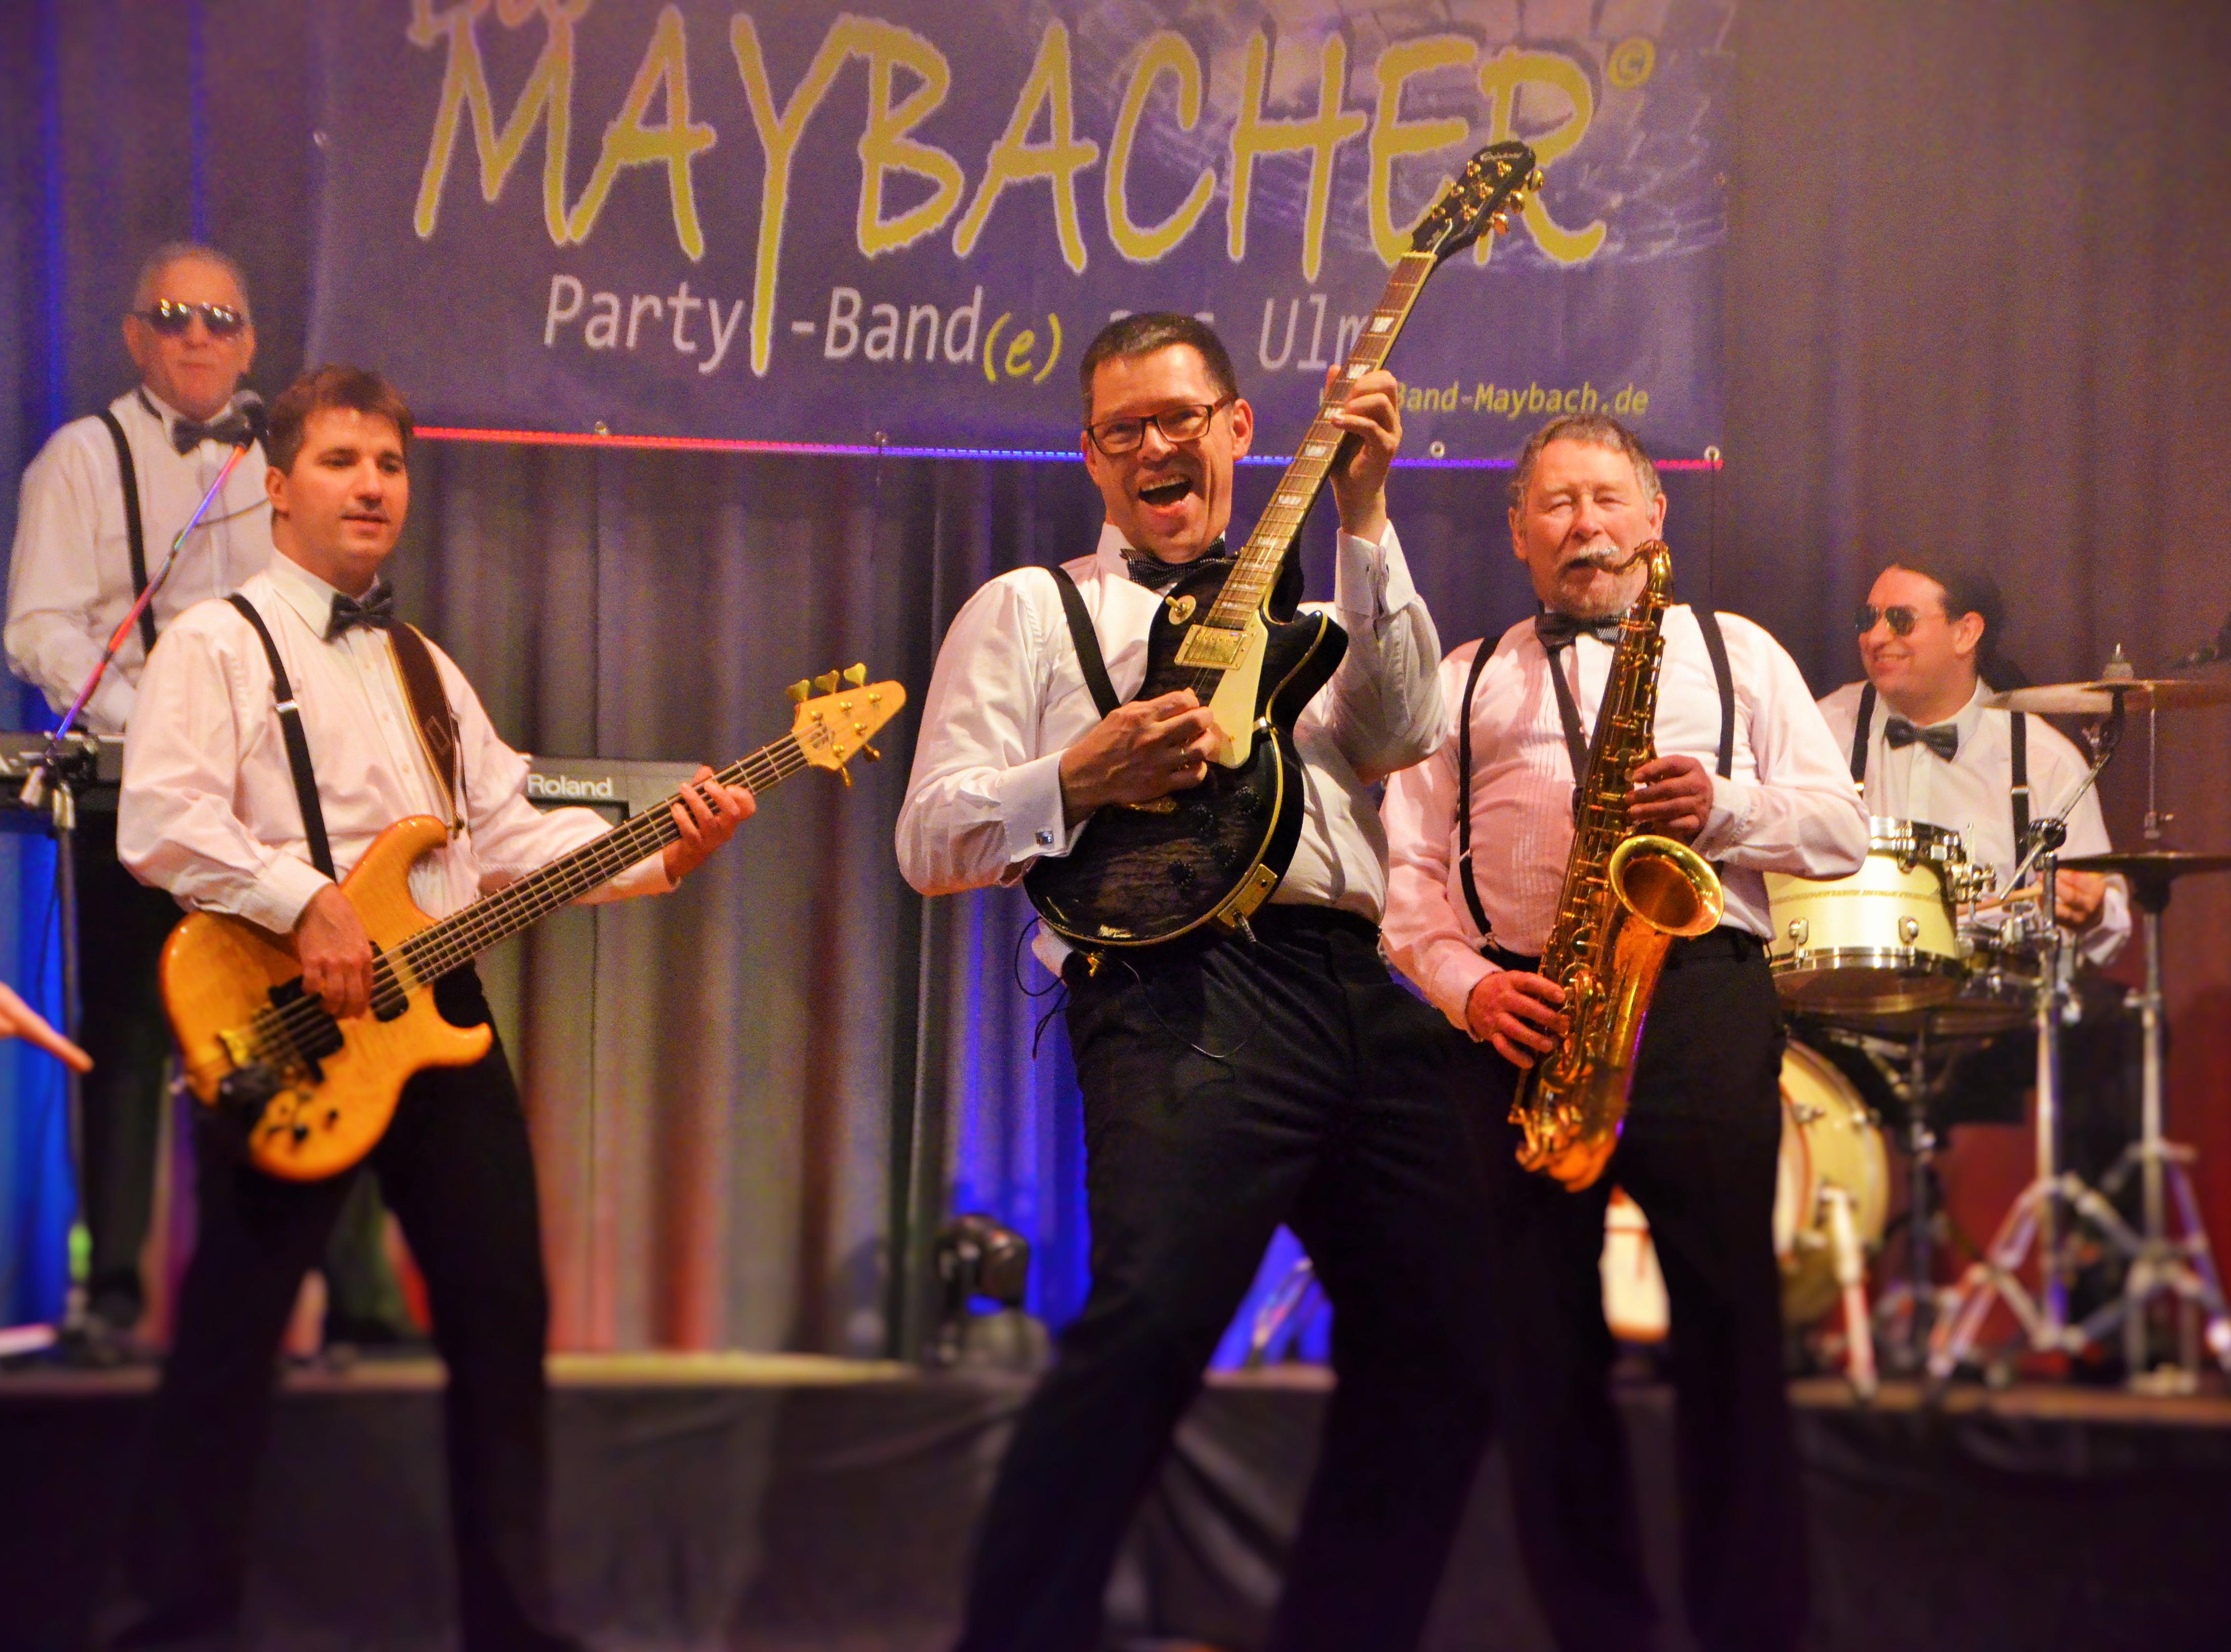 die maybacher partyband ulmdsc_0140 (2) - die maybacher partyband ulm